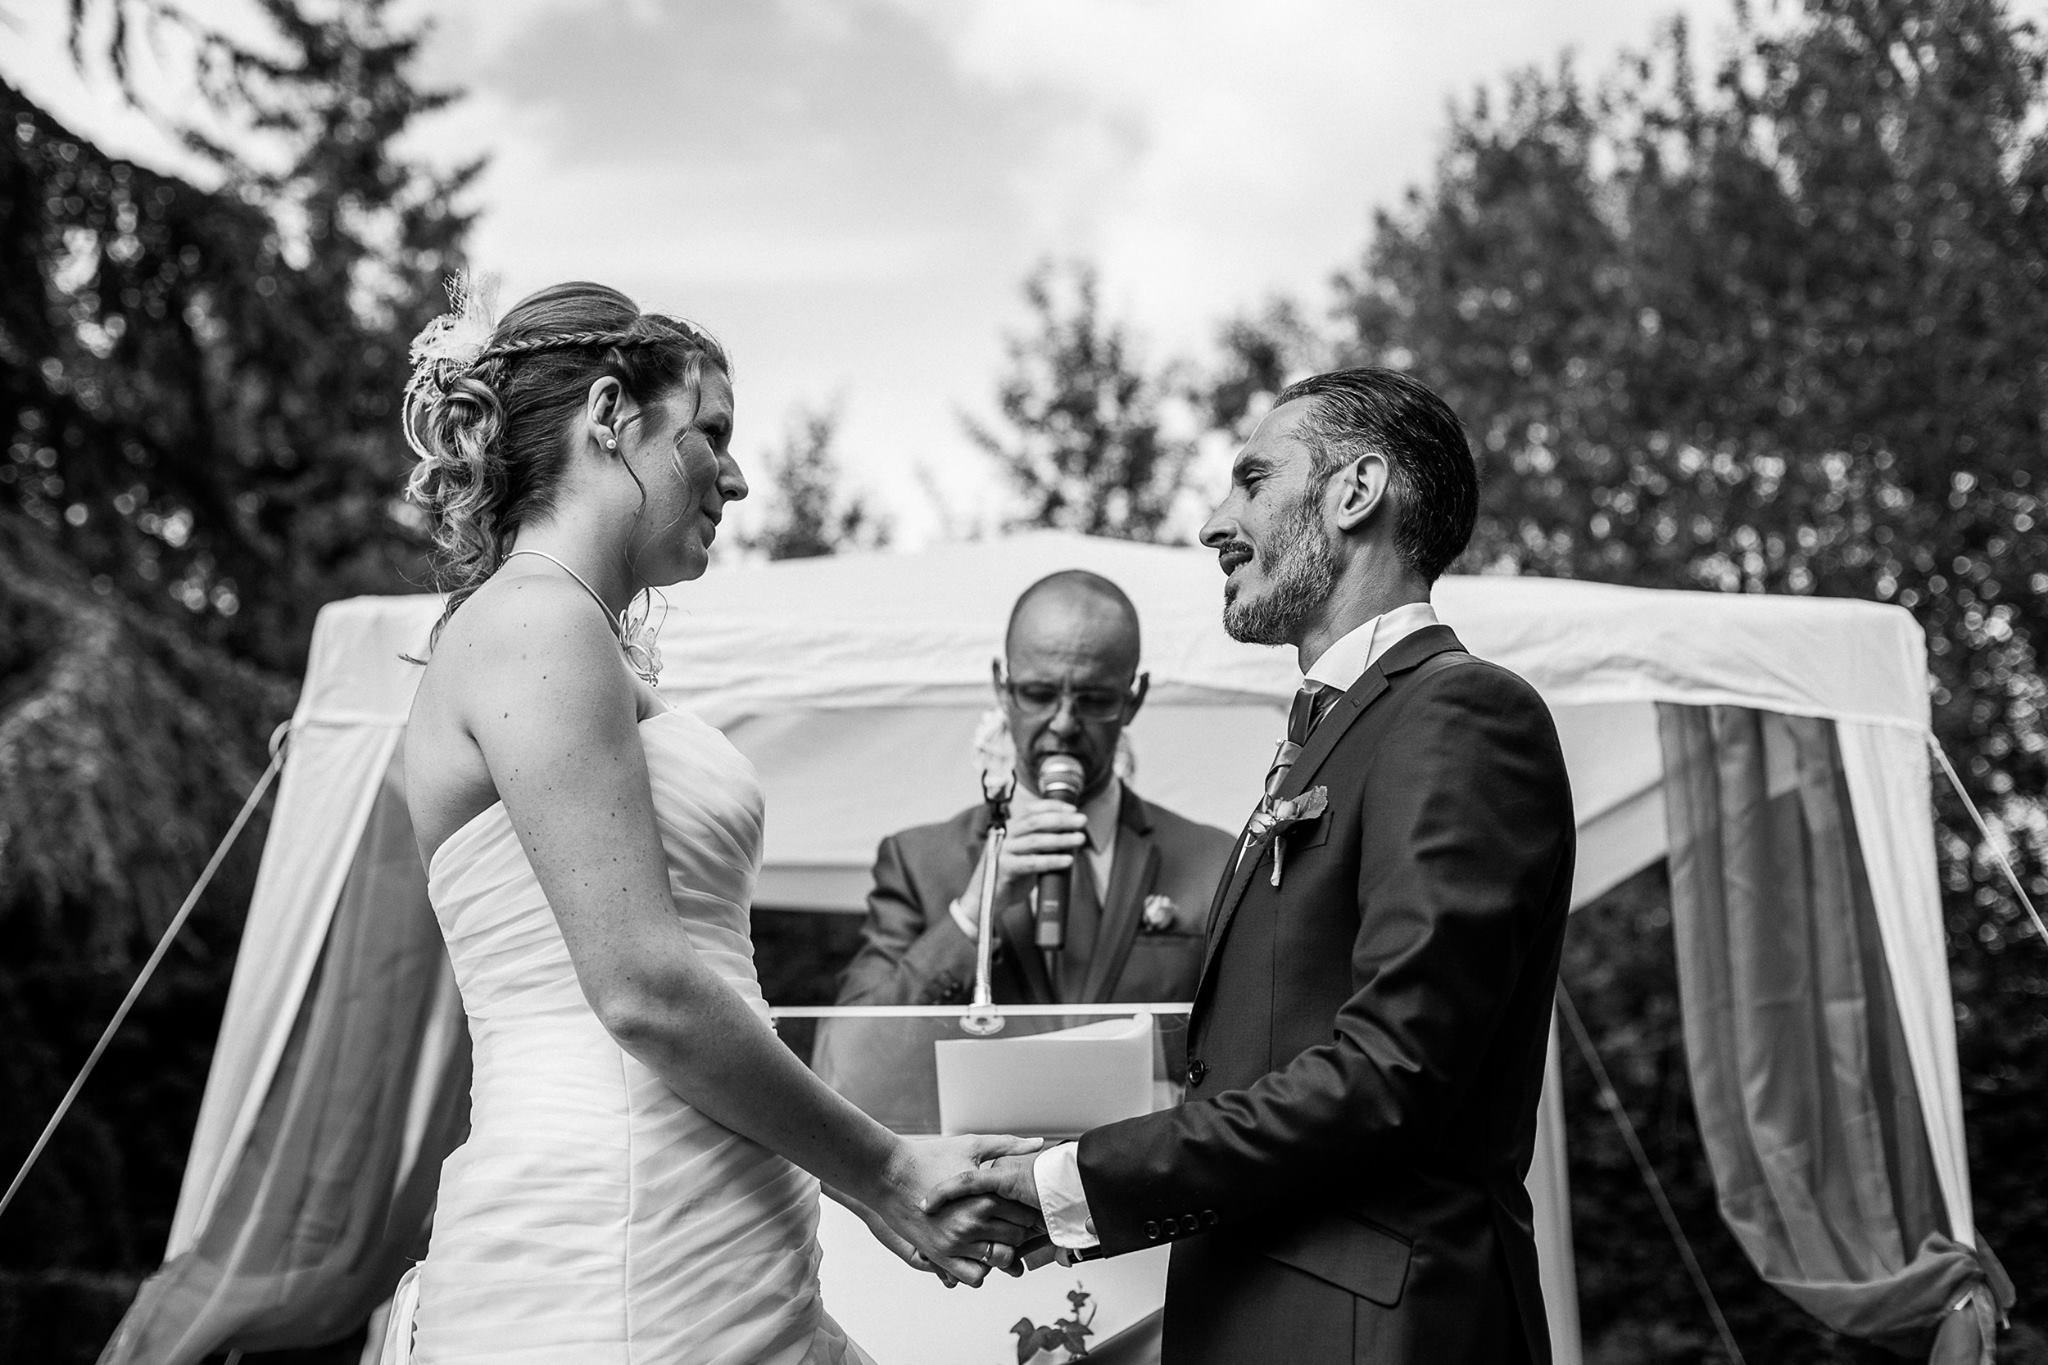 david simoulin officiant mariage lac - Mariage Laic